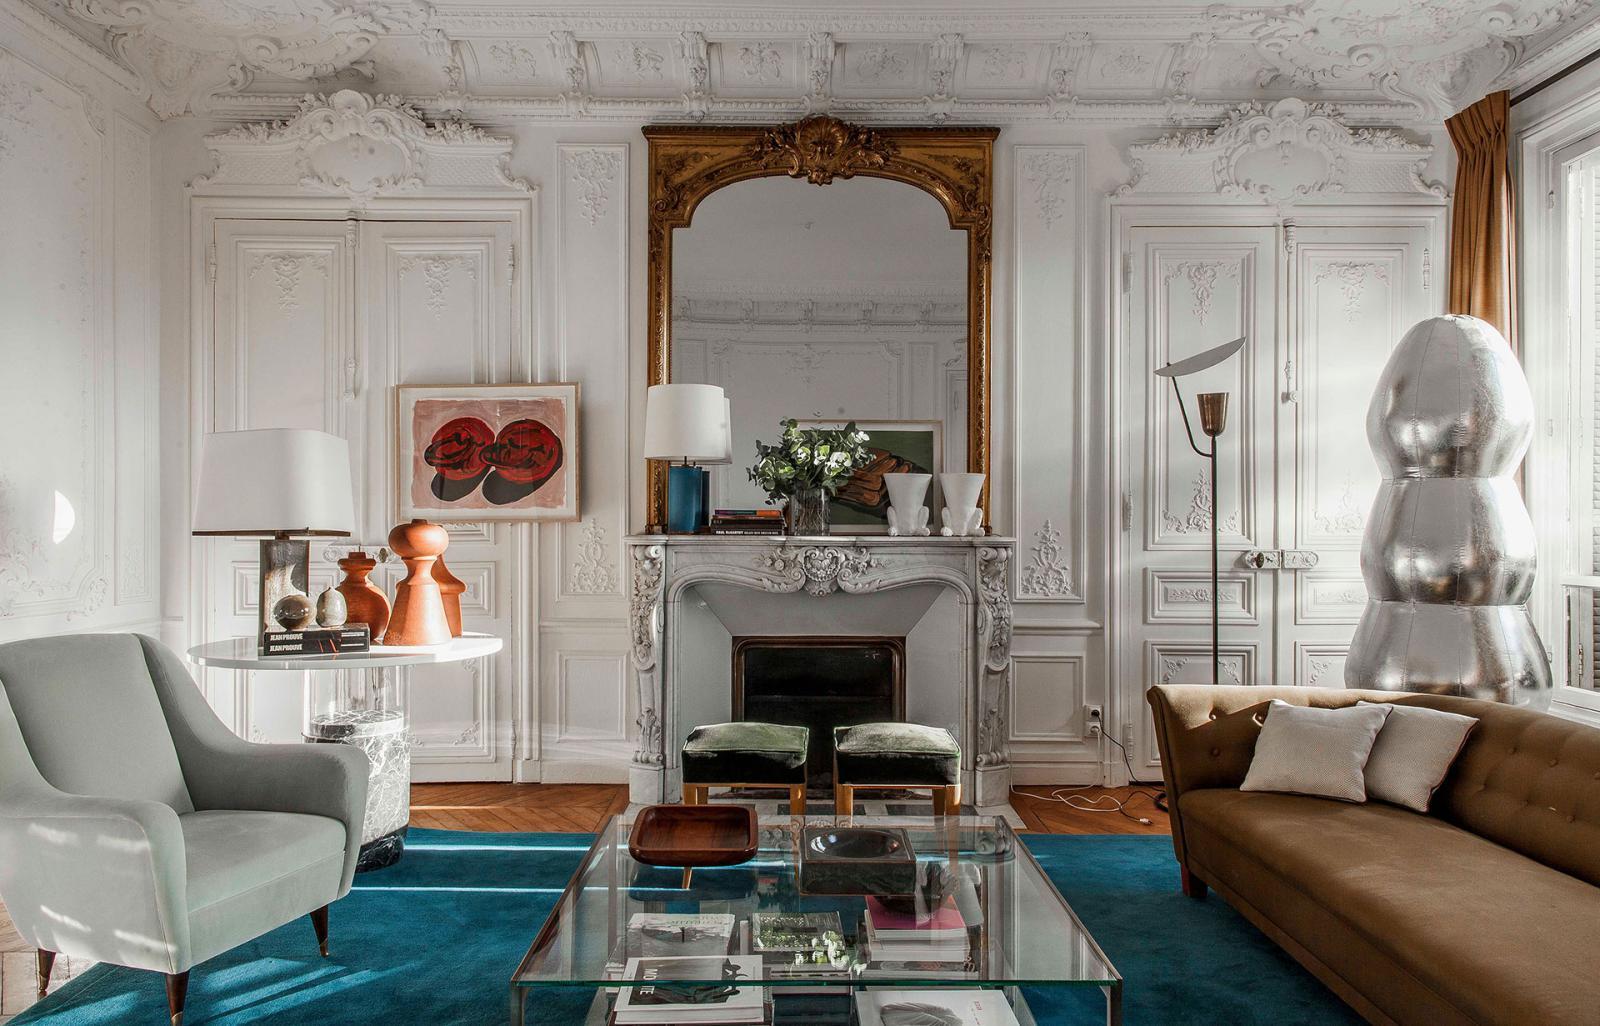 5 кодов французского интерьера • Интерьеры • Дизайн ...